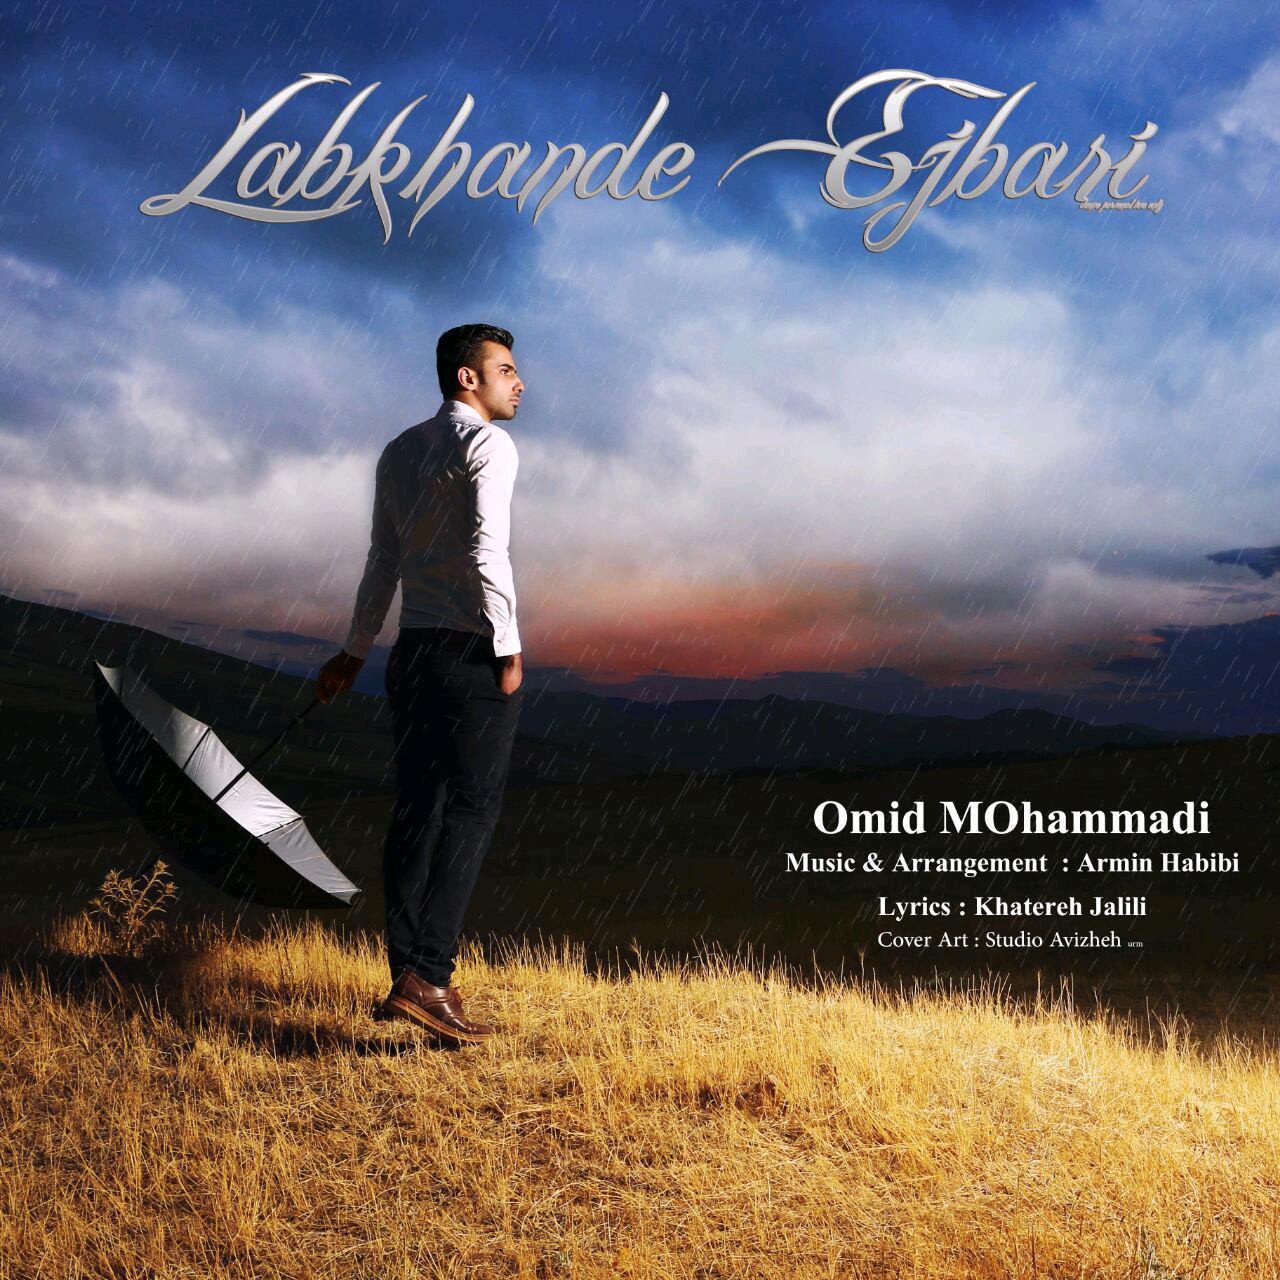 Omid Mohammadi – Labkhandeh Ejbari